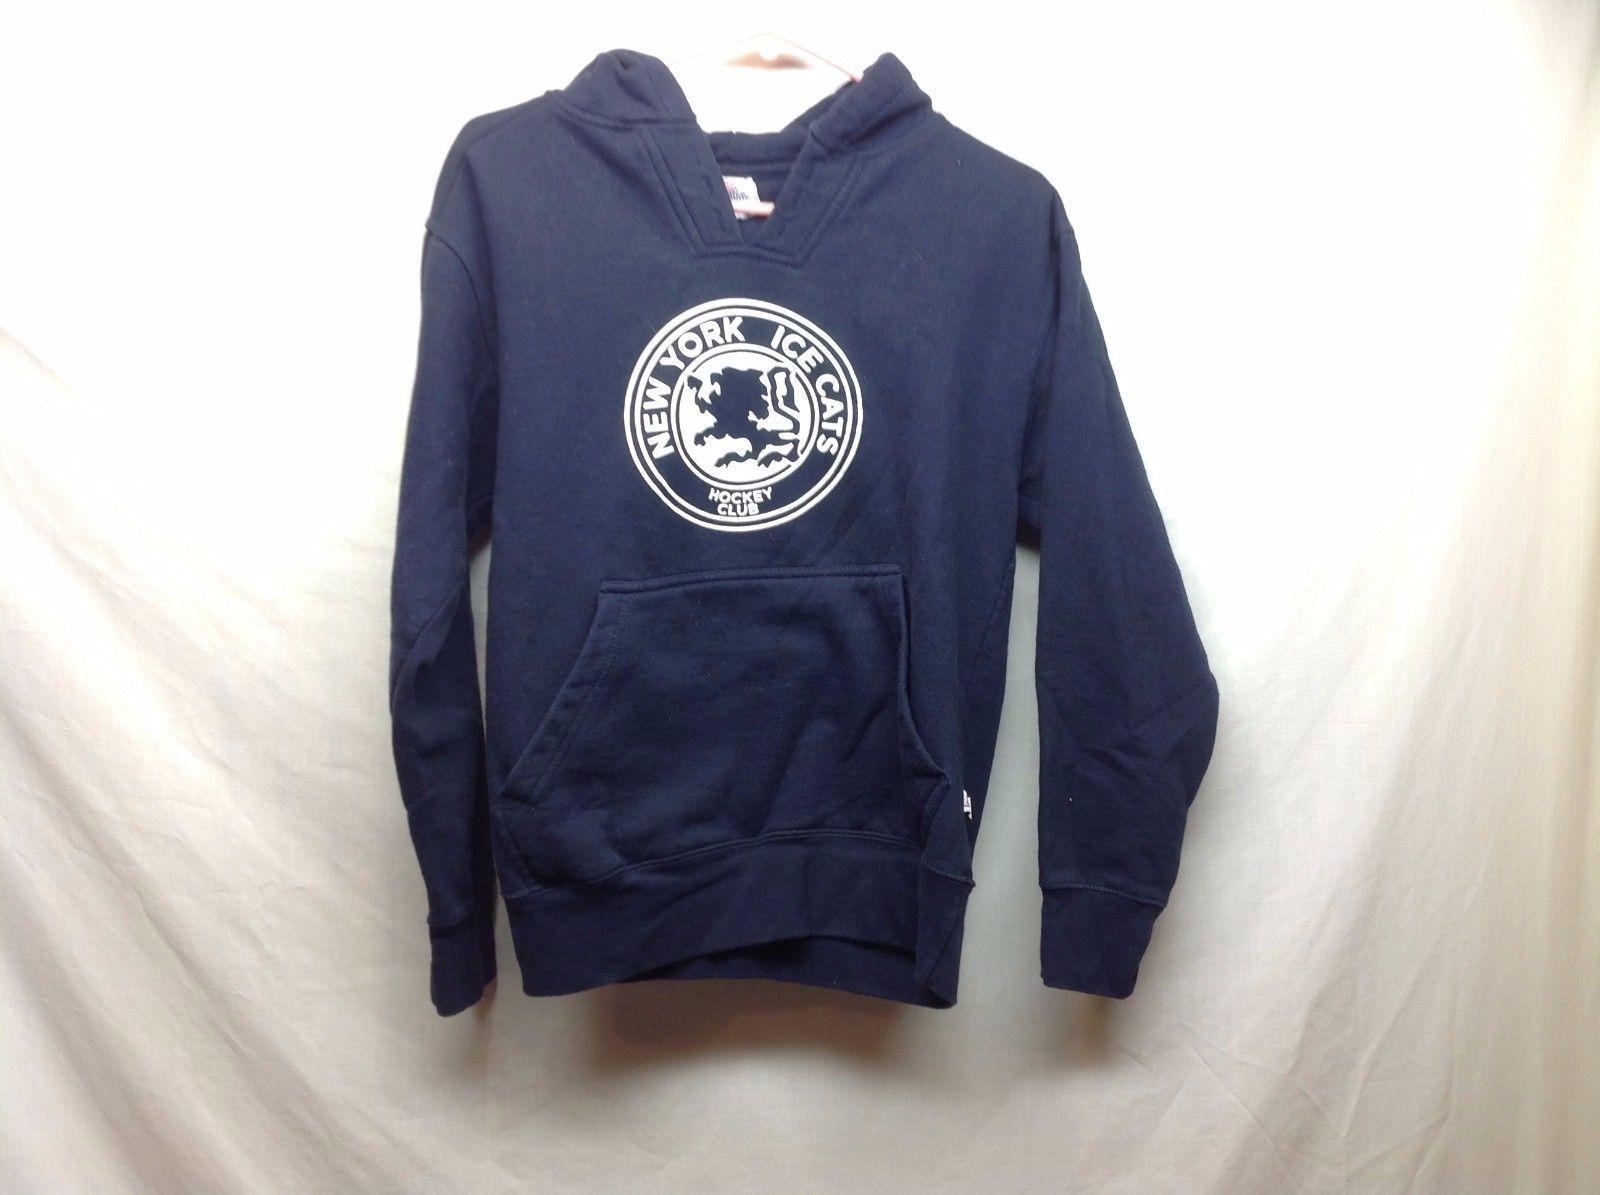 New York Ice Cats Dark Navy Blue Sweatshirt Hoodie Sz XS